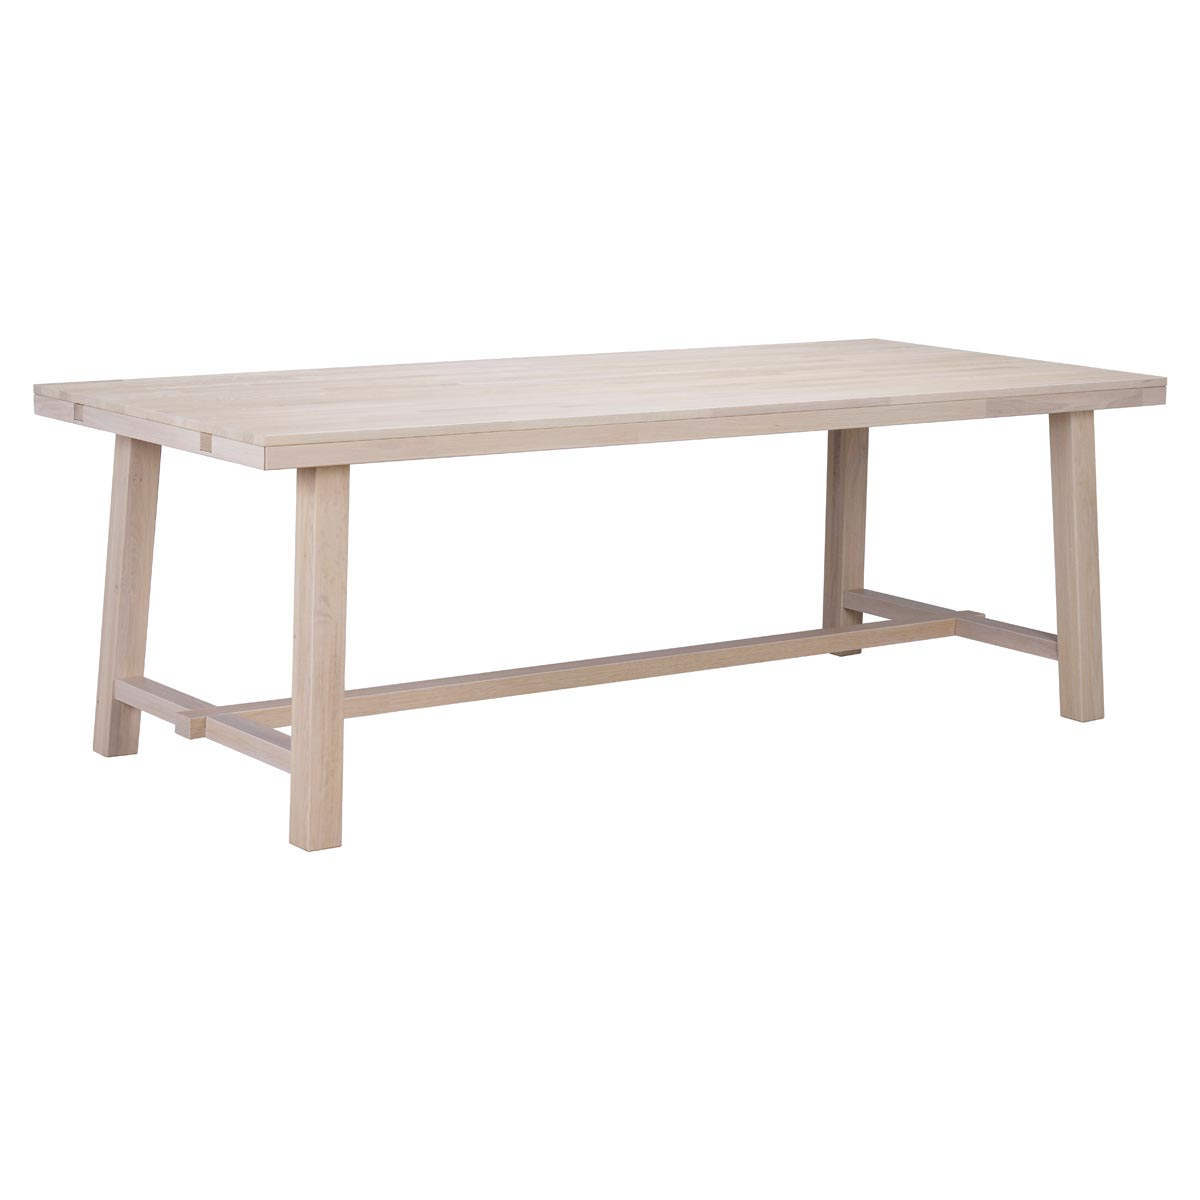 George-matbord-220-ww-vitpigmenterad-108561